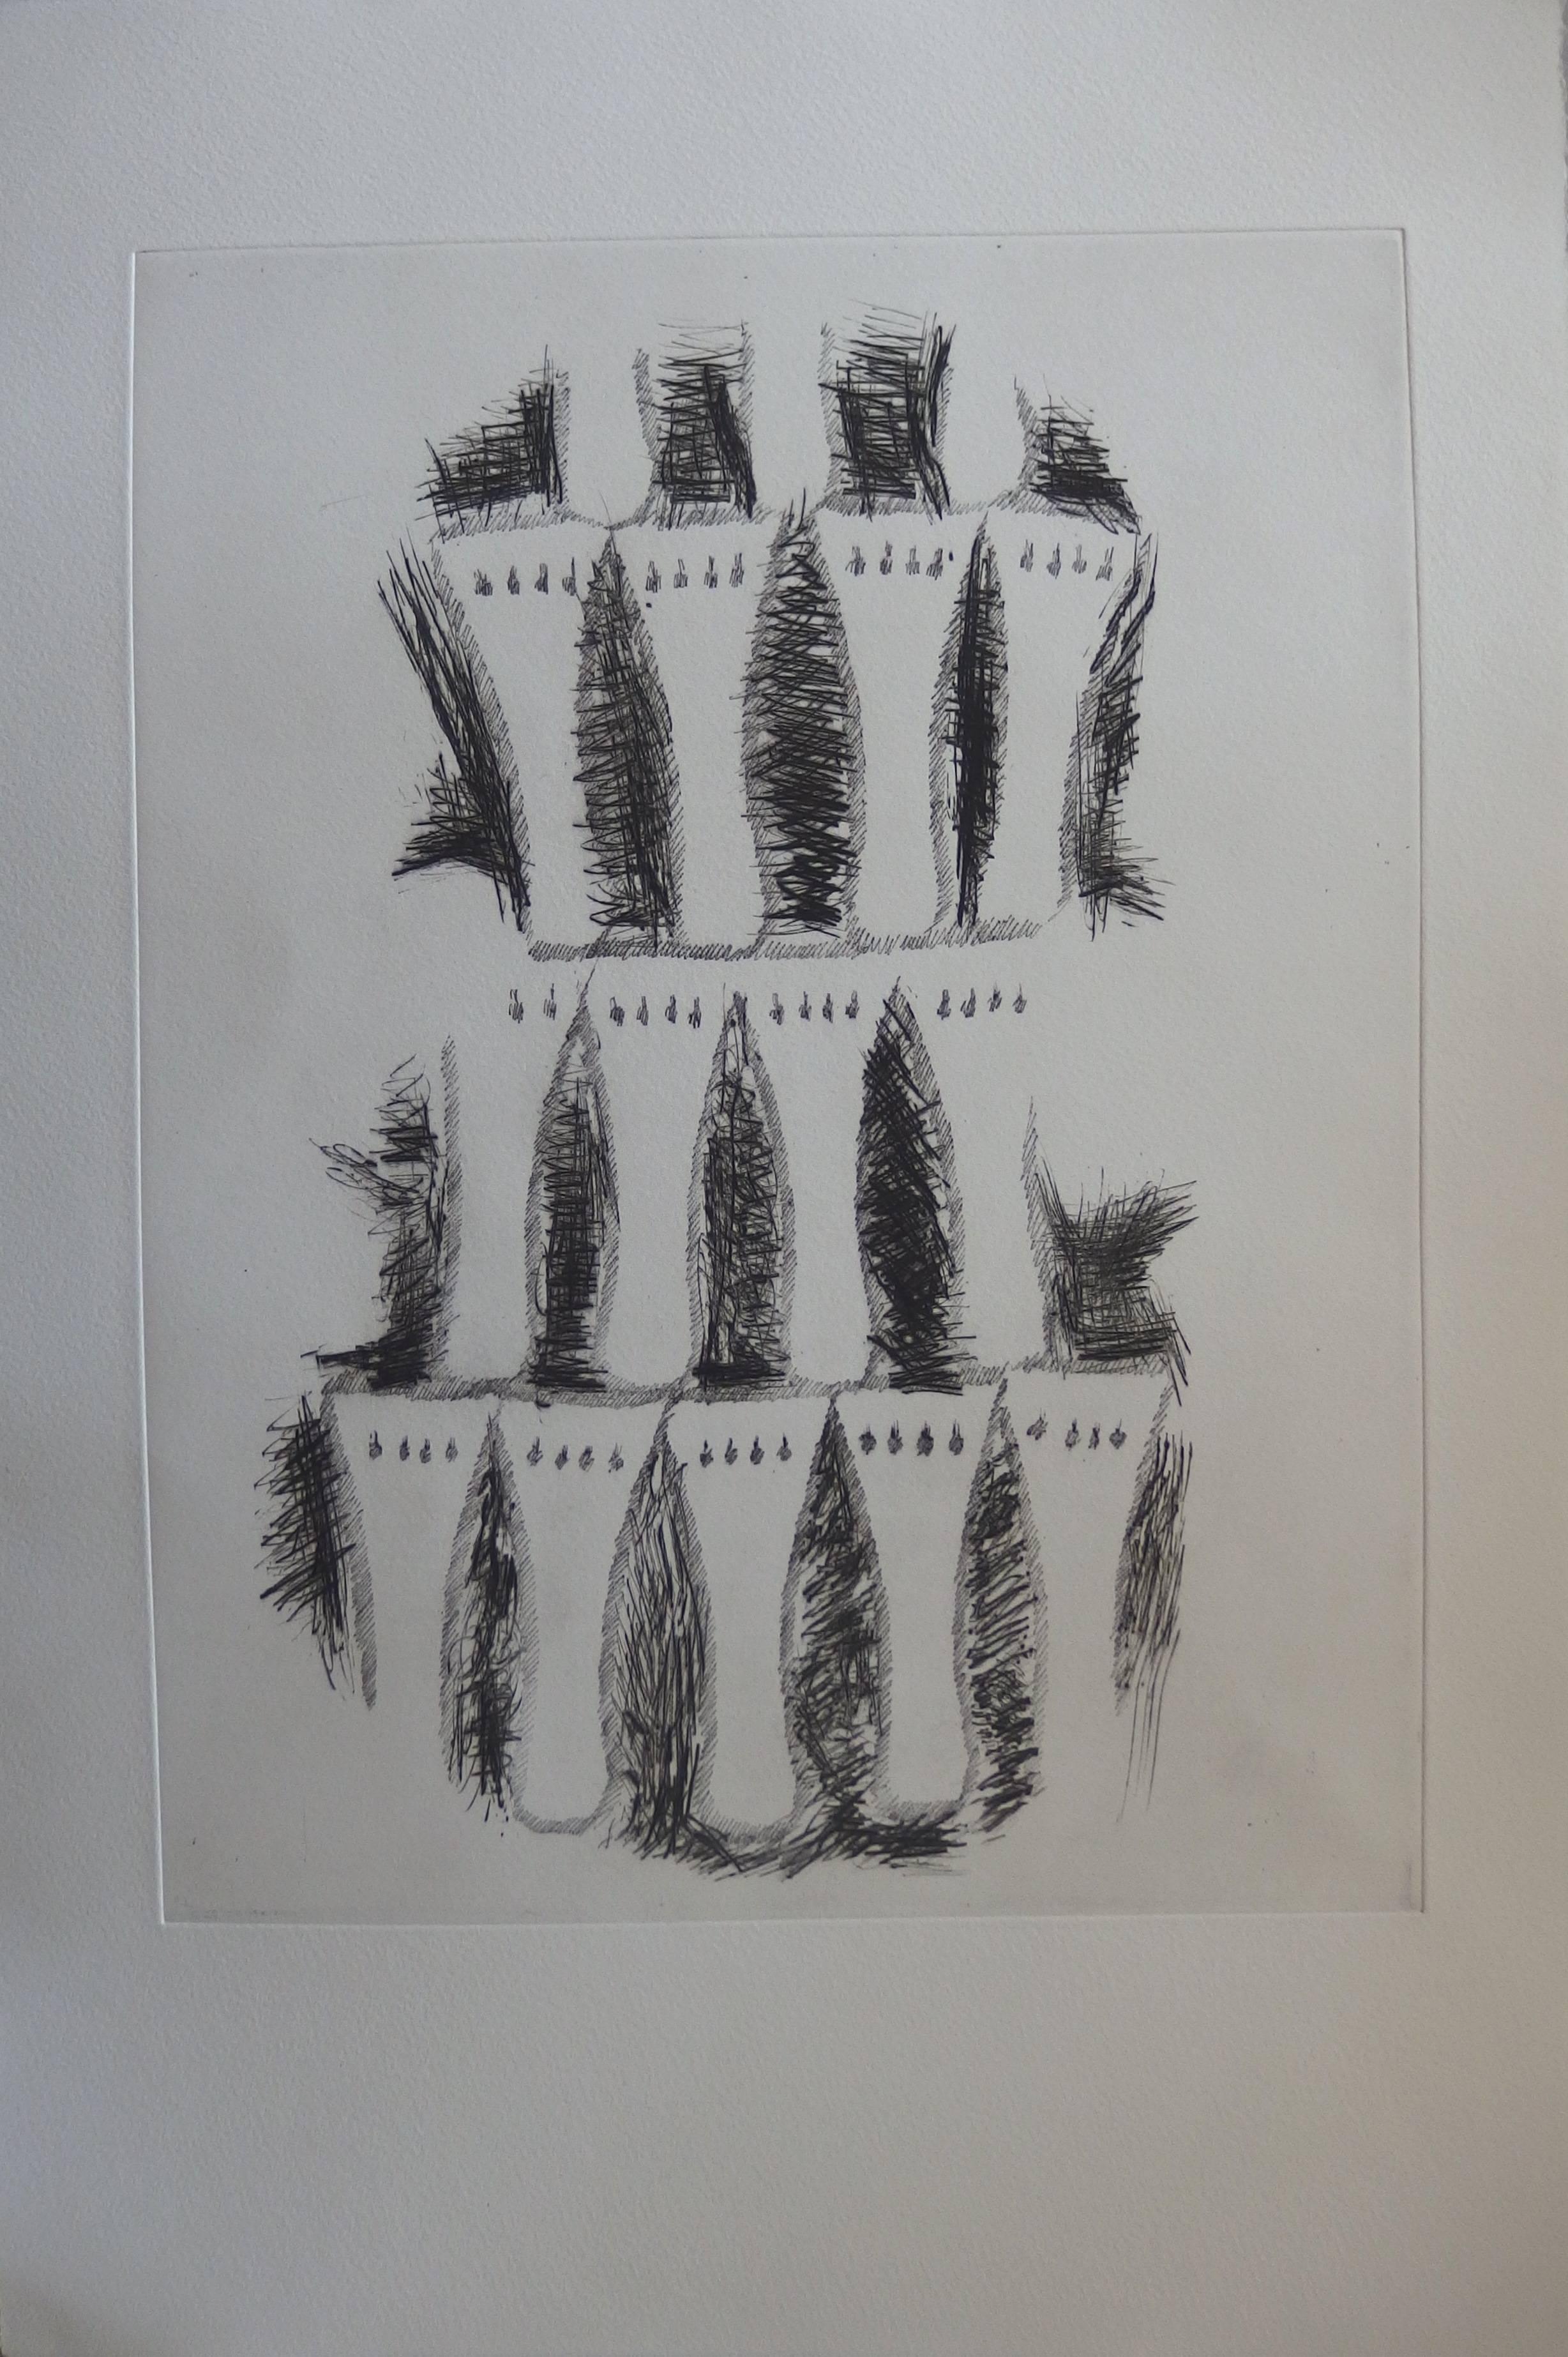 Impression of violin - Original etching - 1979